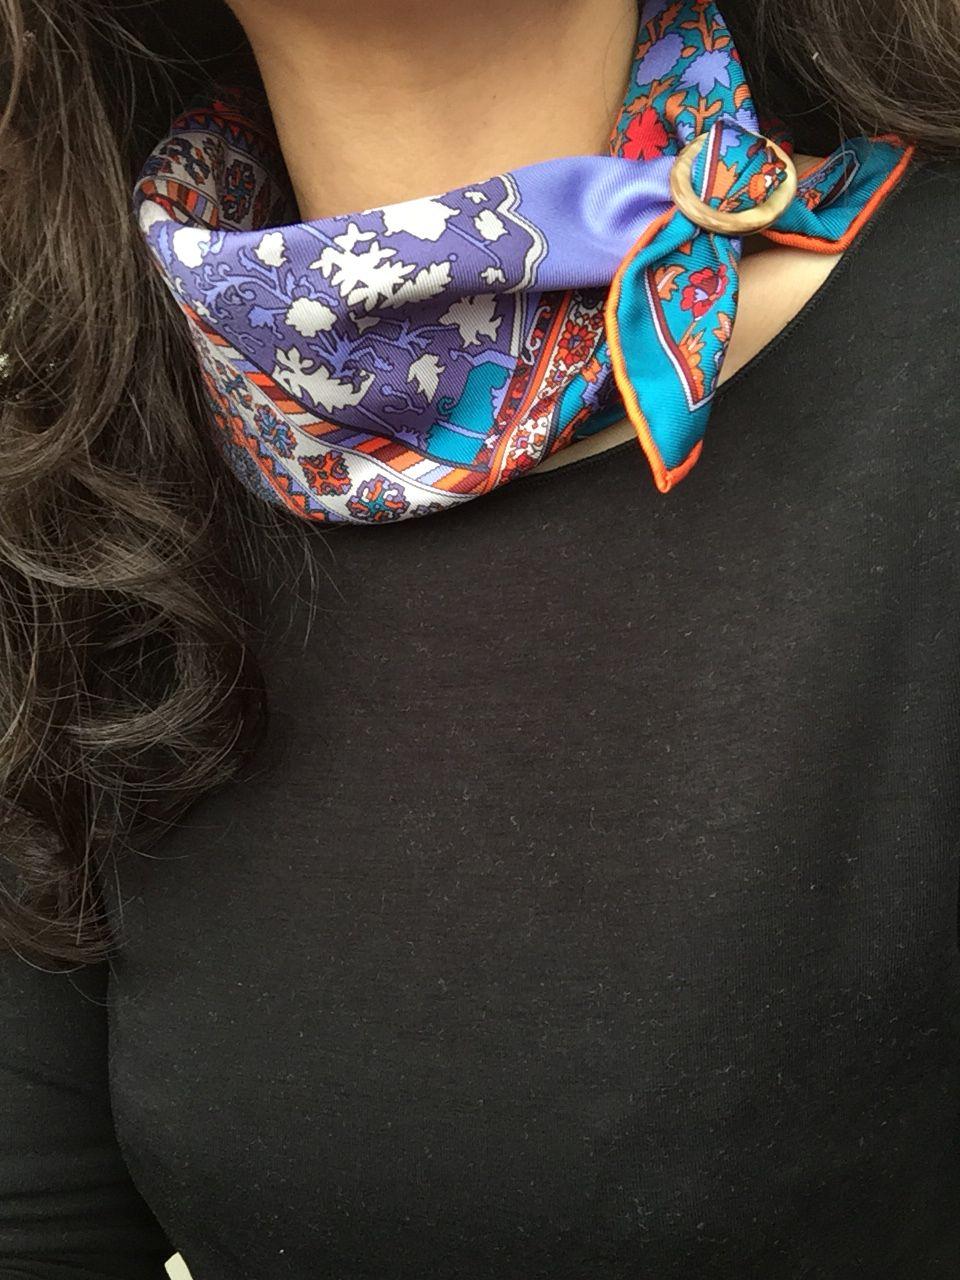 Herm s gavroche majestic tee silk scarfs pinterest - Hermes tuch binden ...